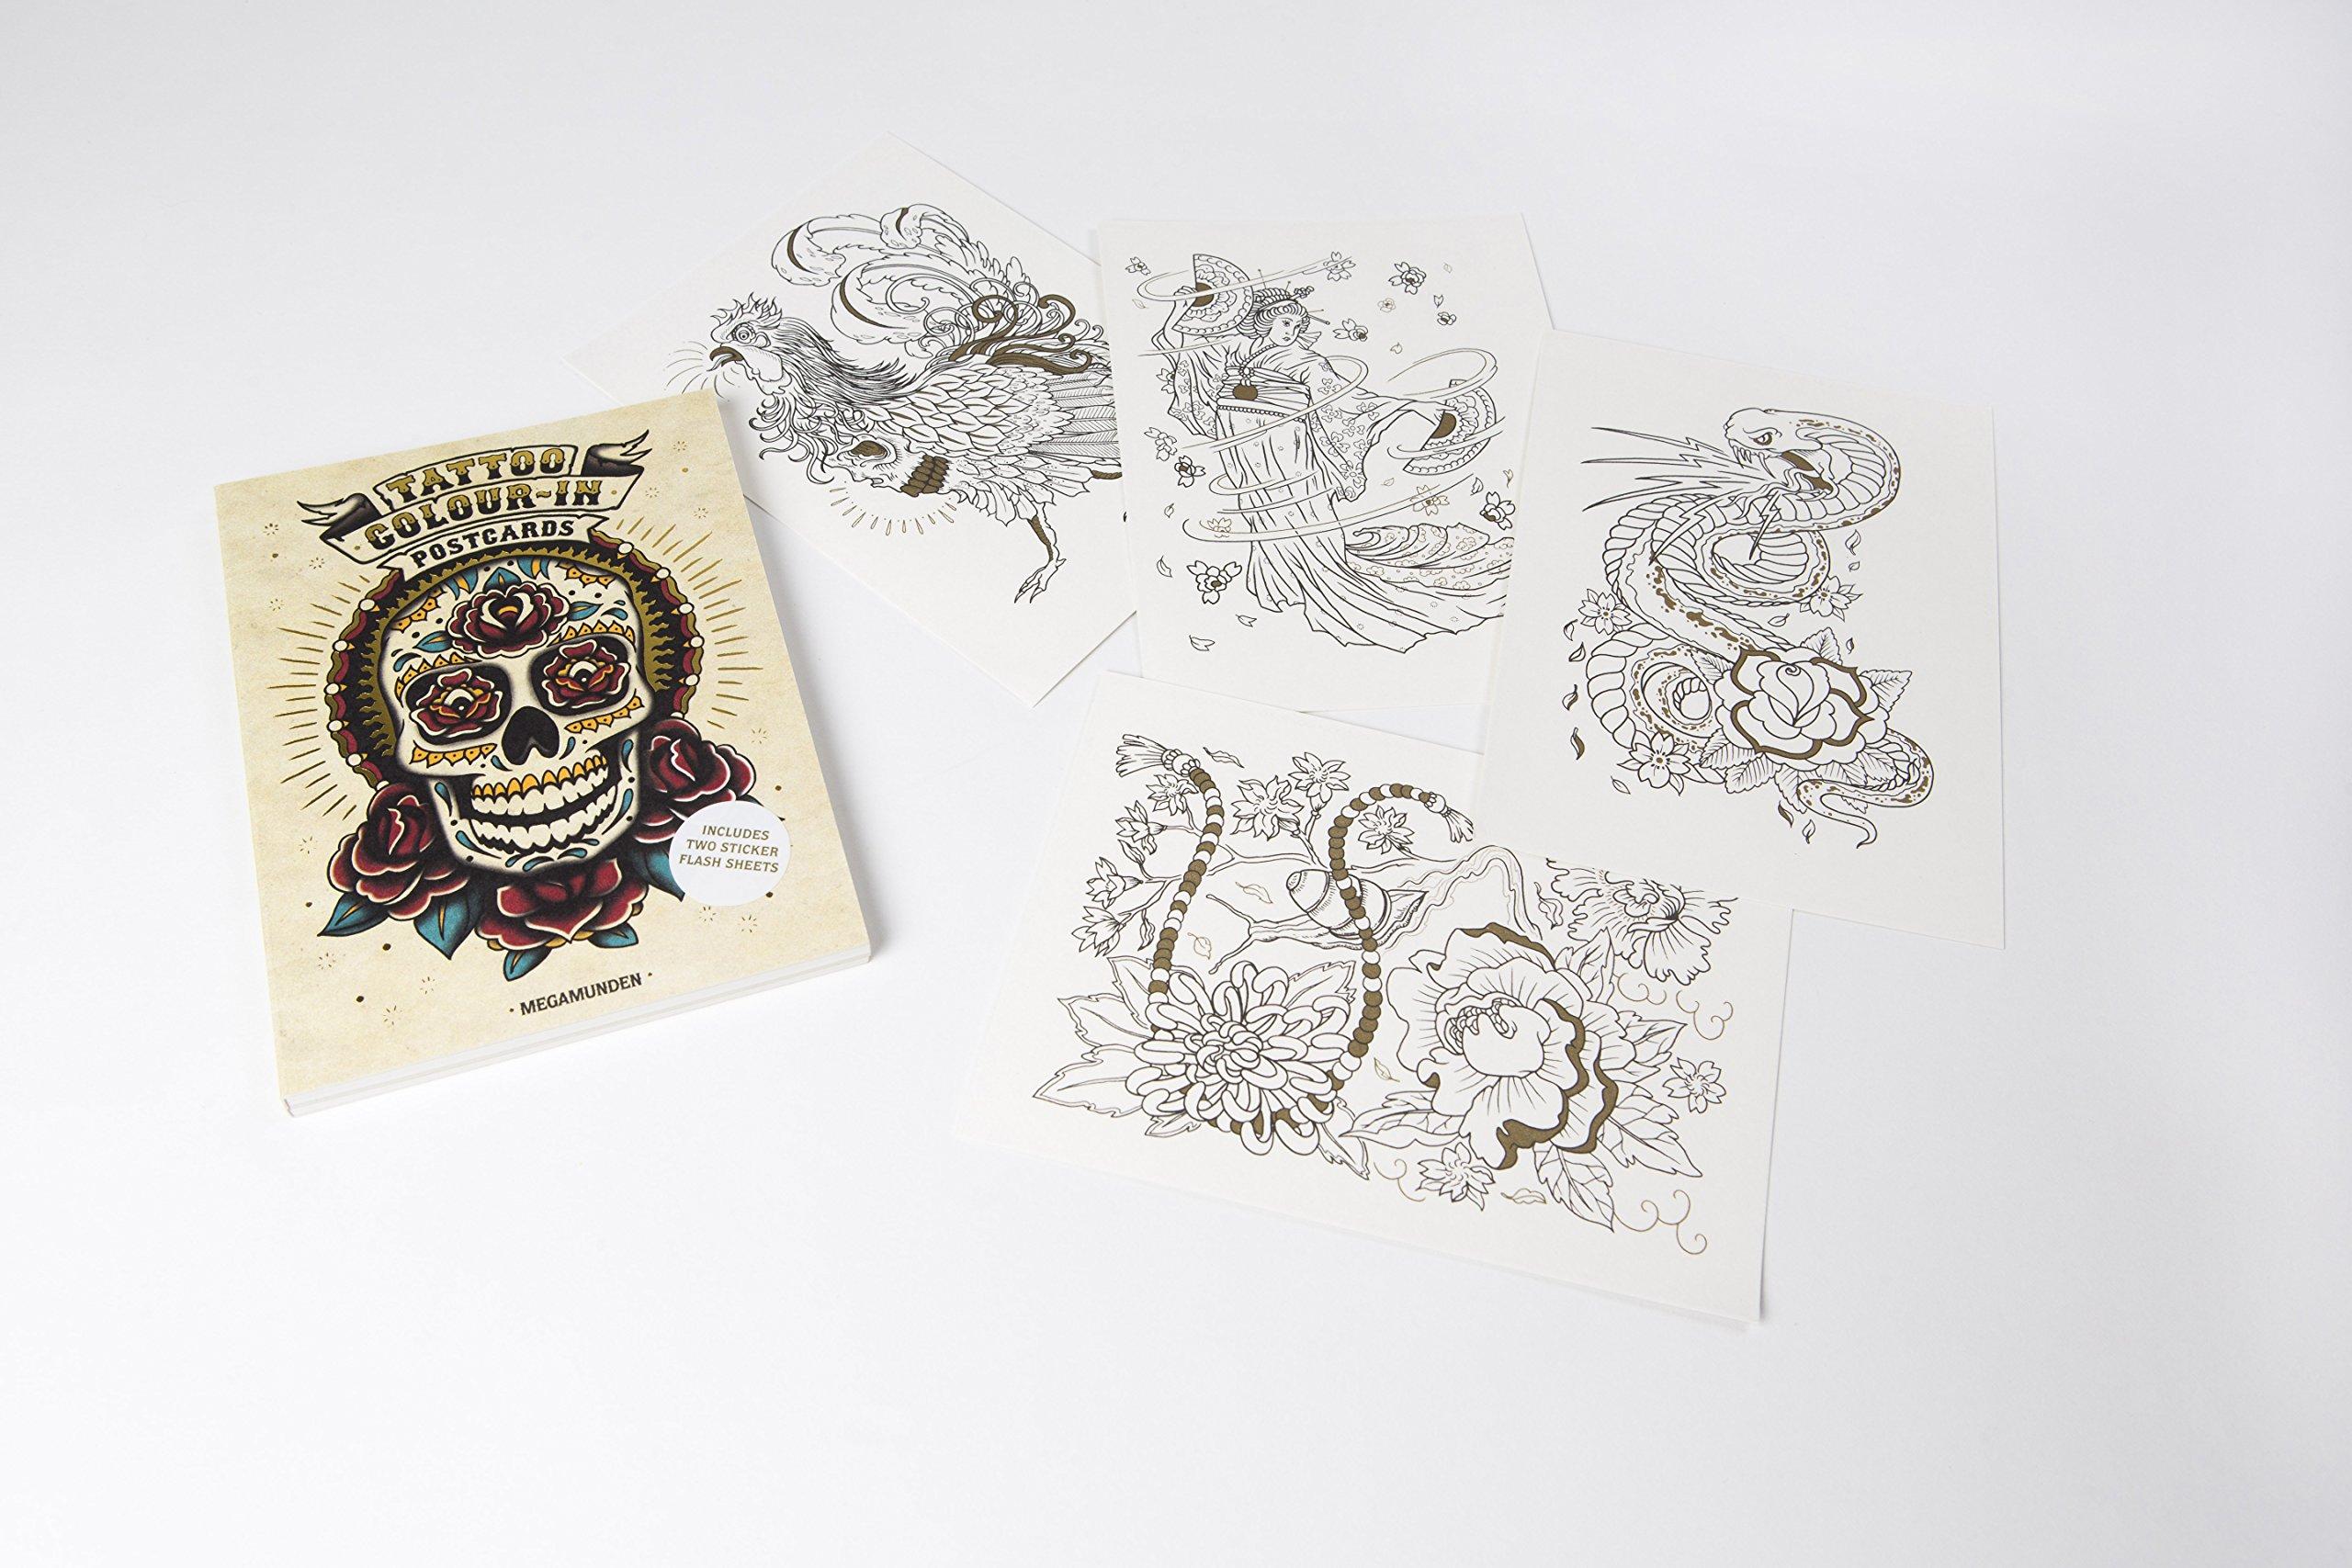 The tattoo coloring book megamunden - Tattoo Color In Postcards Megamunden 9781856699594 Amazon Com Books